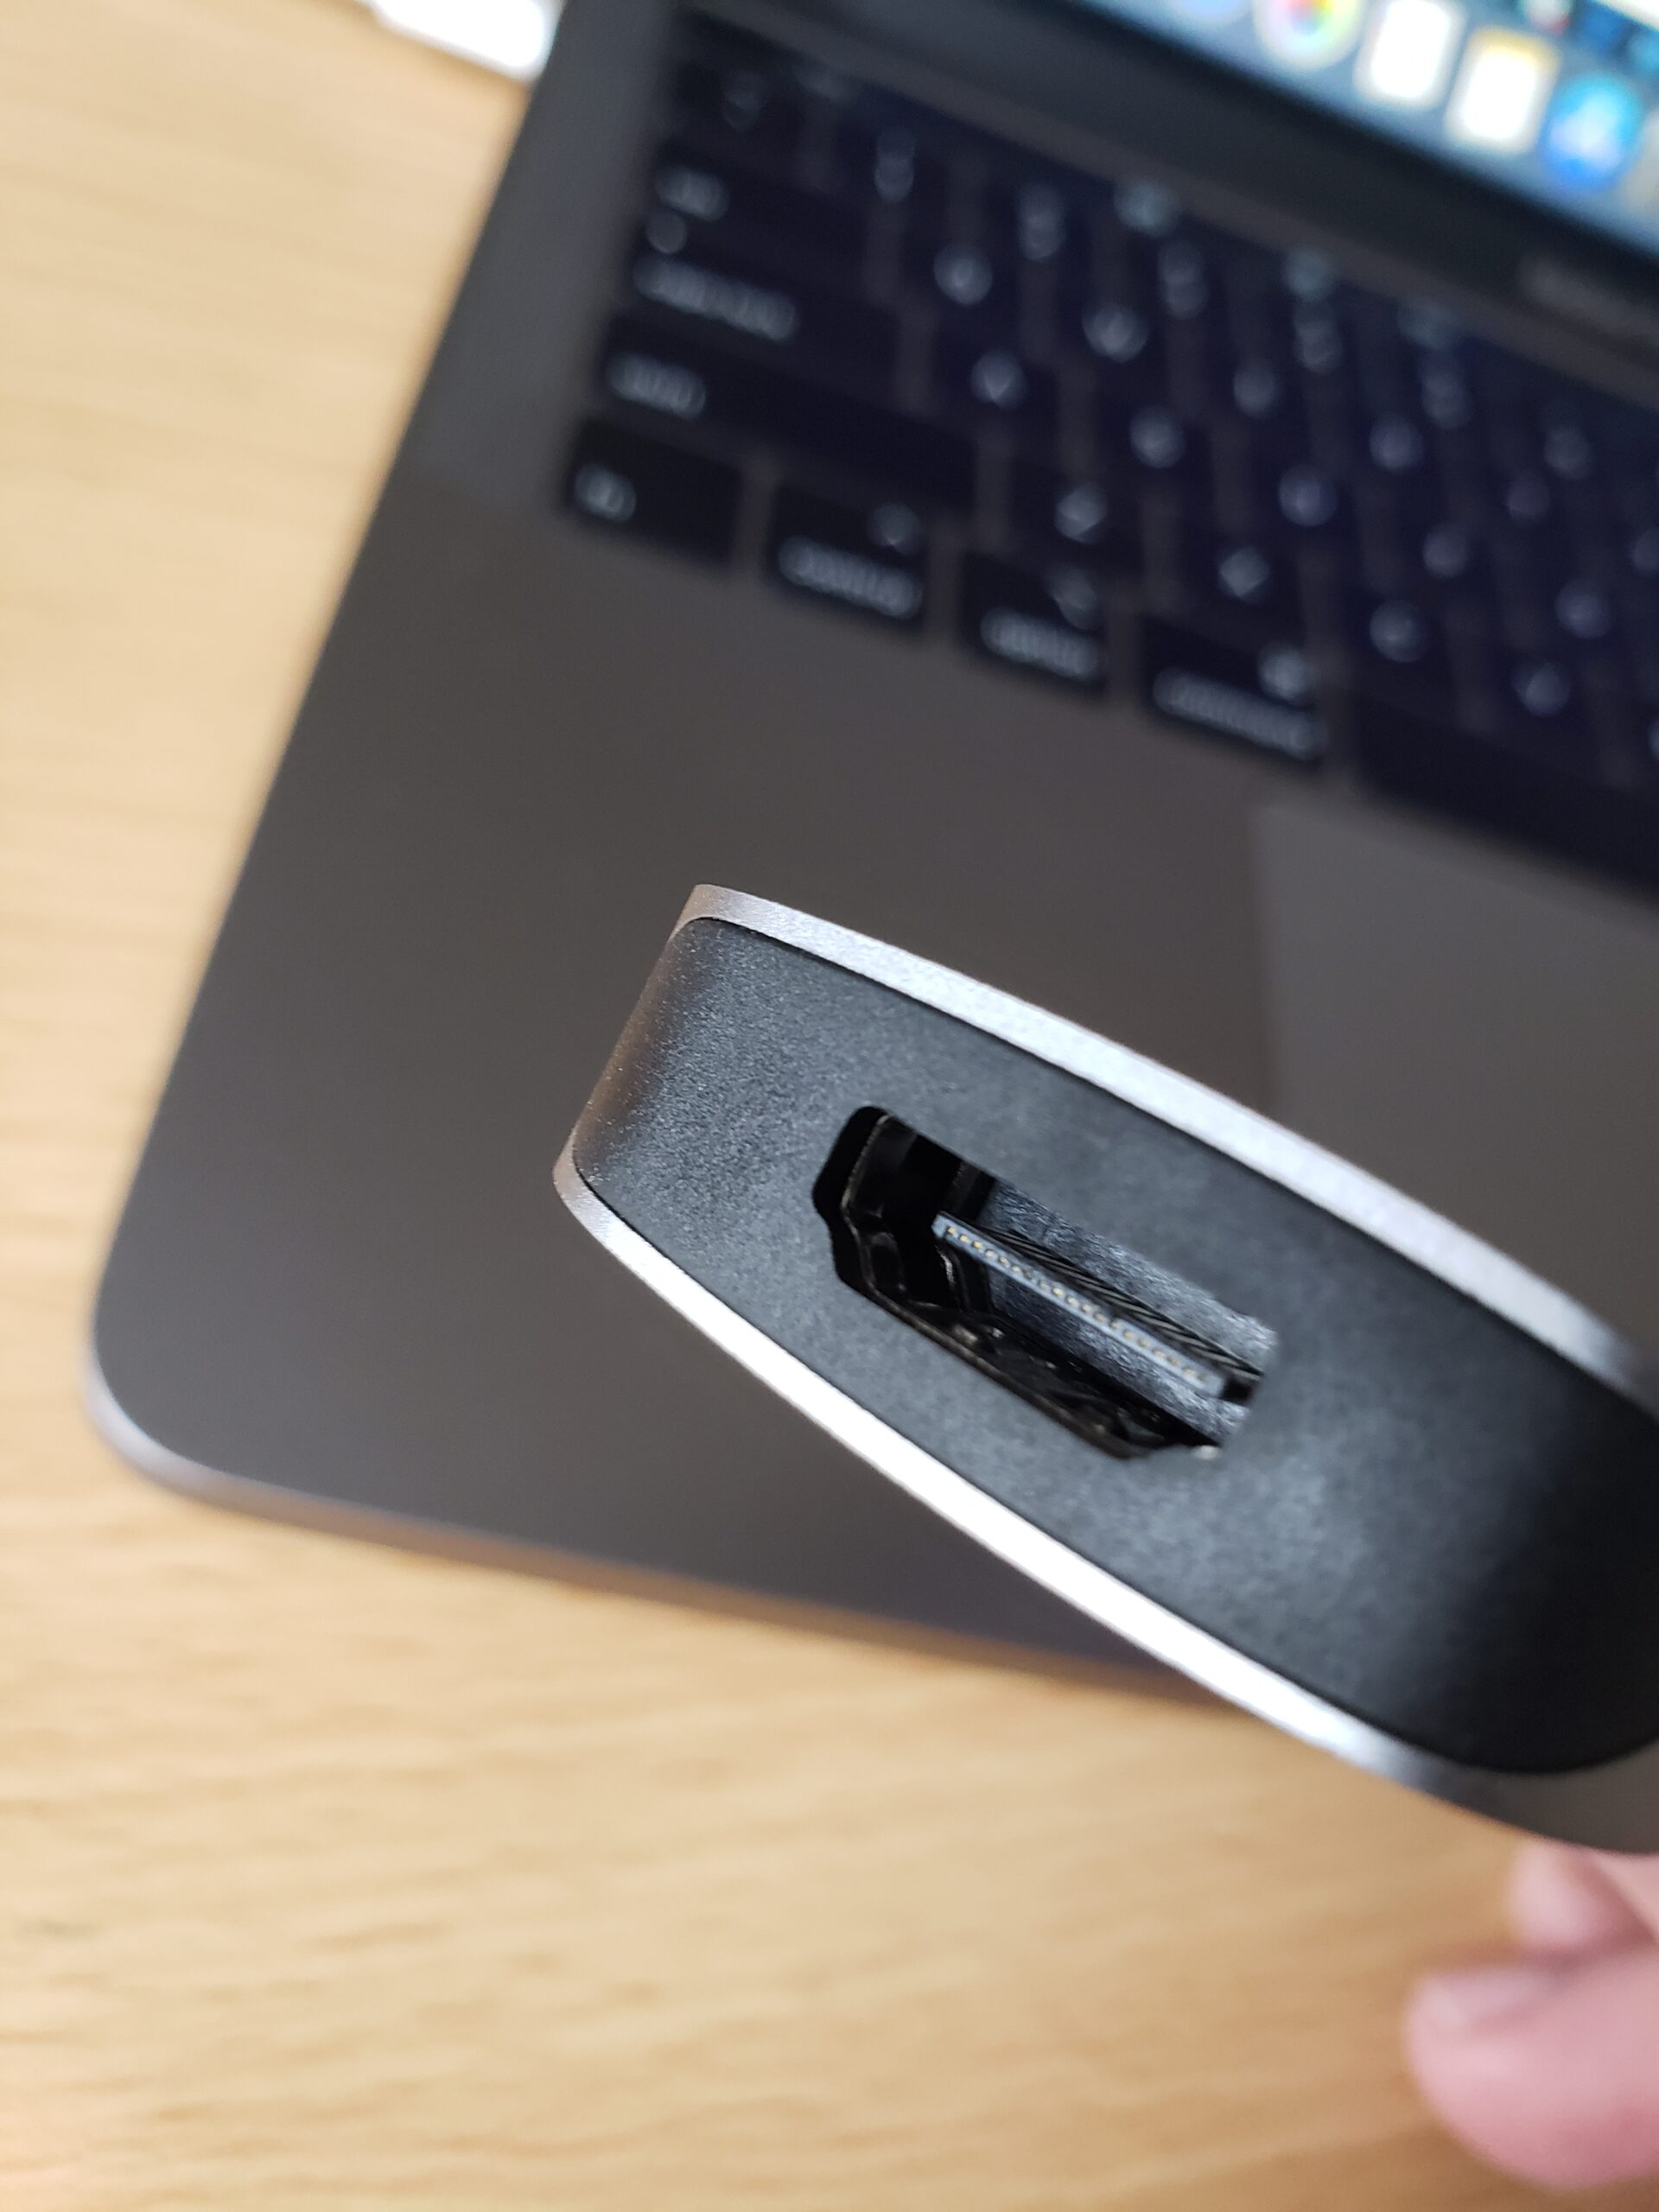 Kinivo 710UC HDMI port